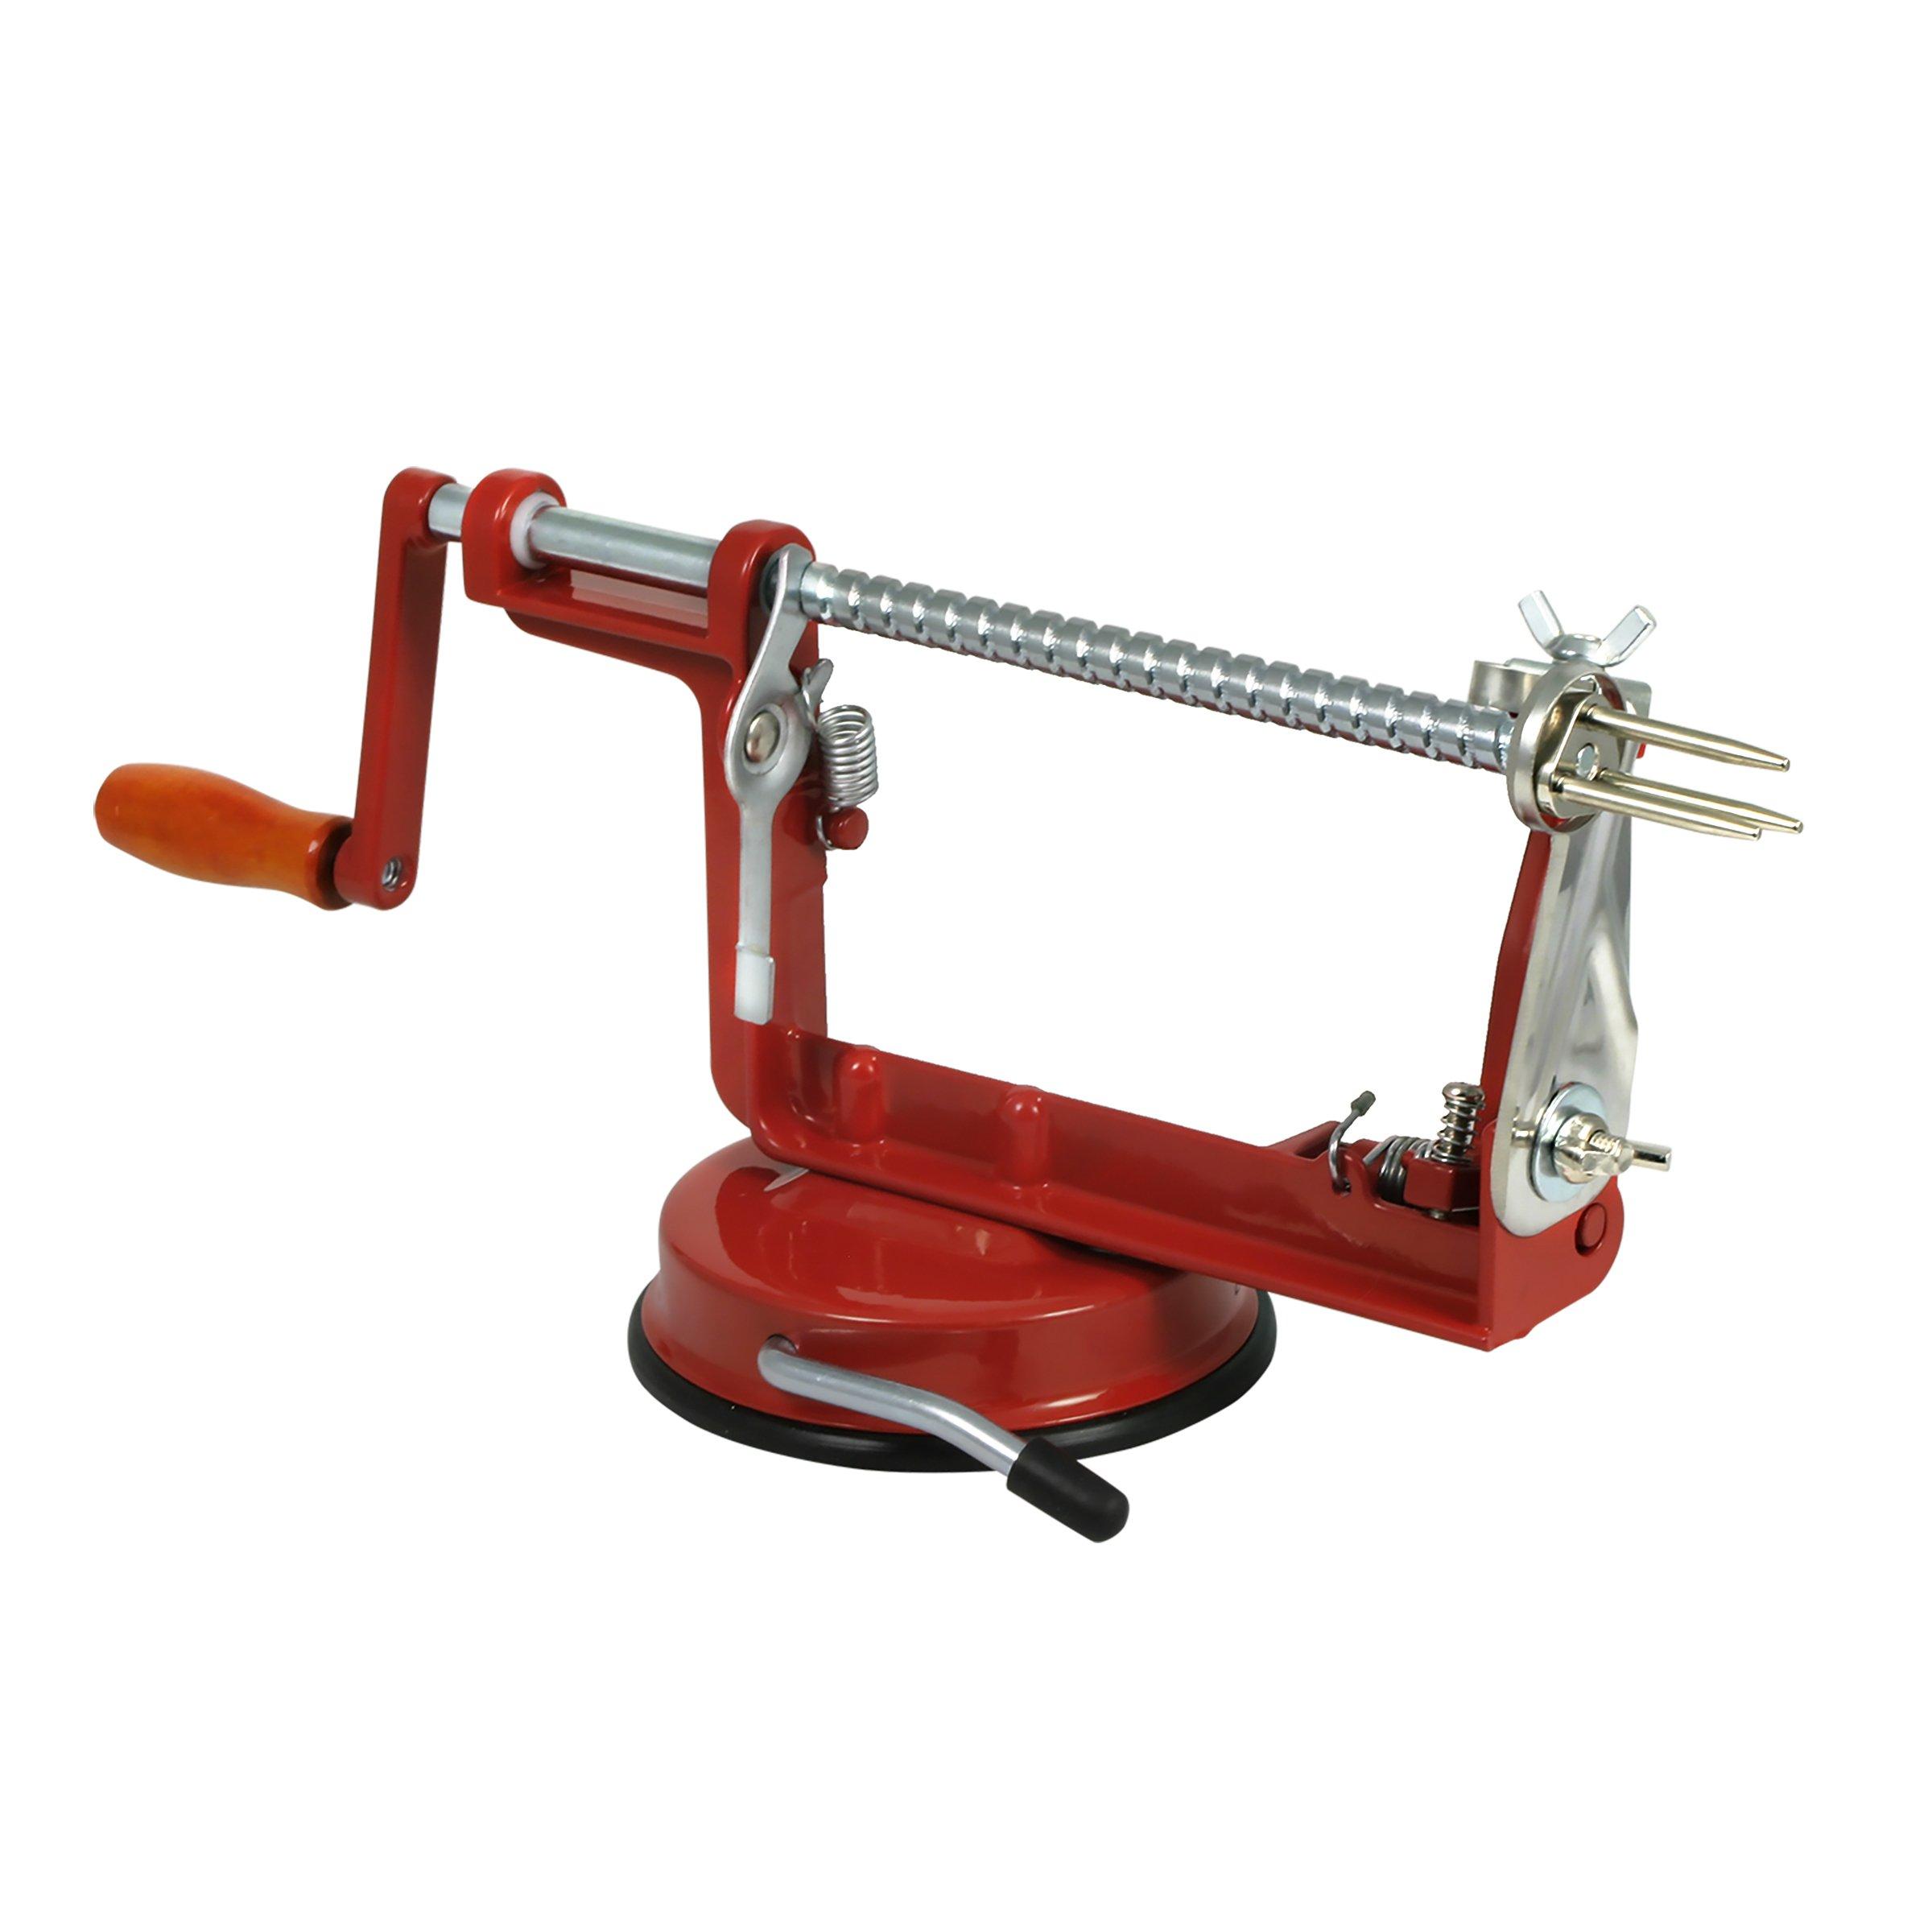 Farberware 5162120 Apple Peeler, Slicer and Corer, Small, Red by Farberware